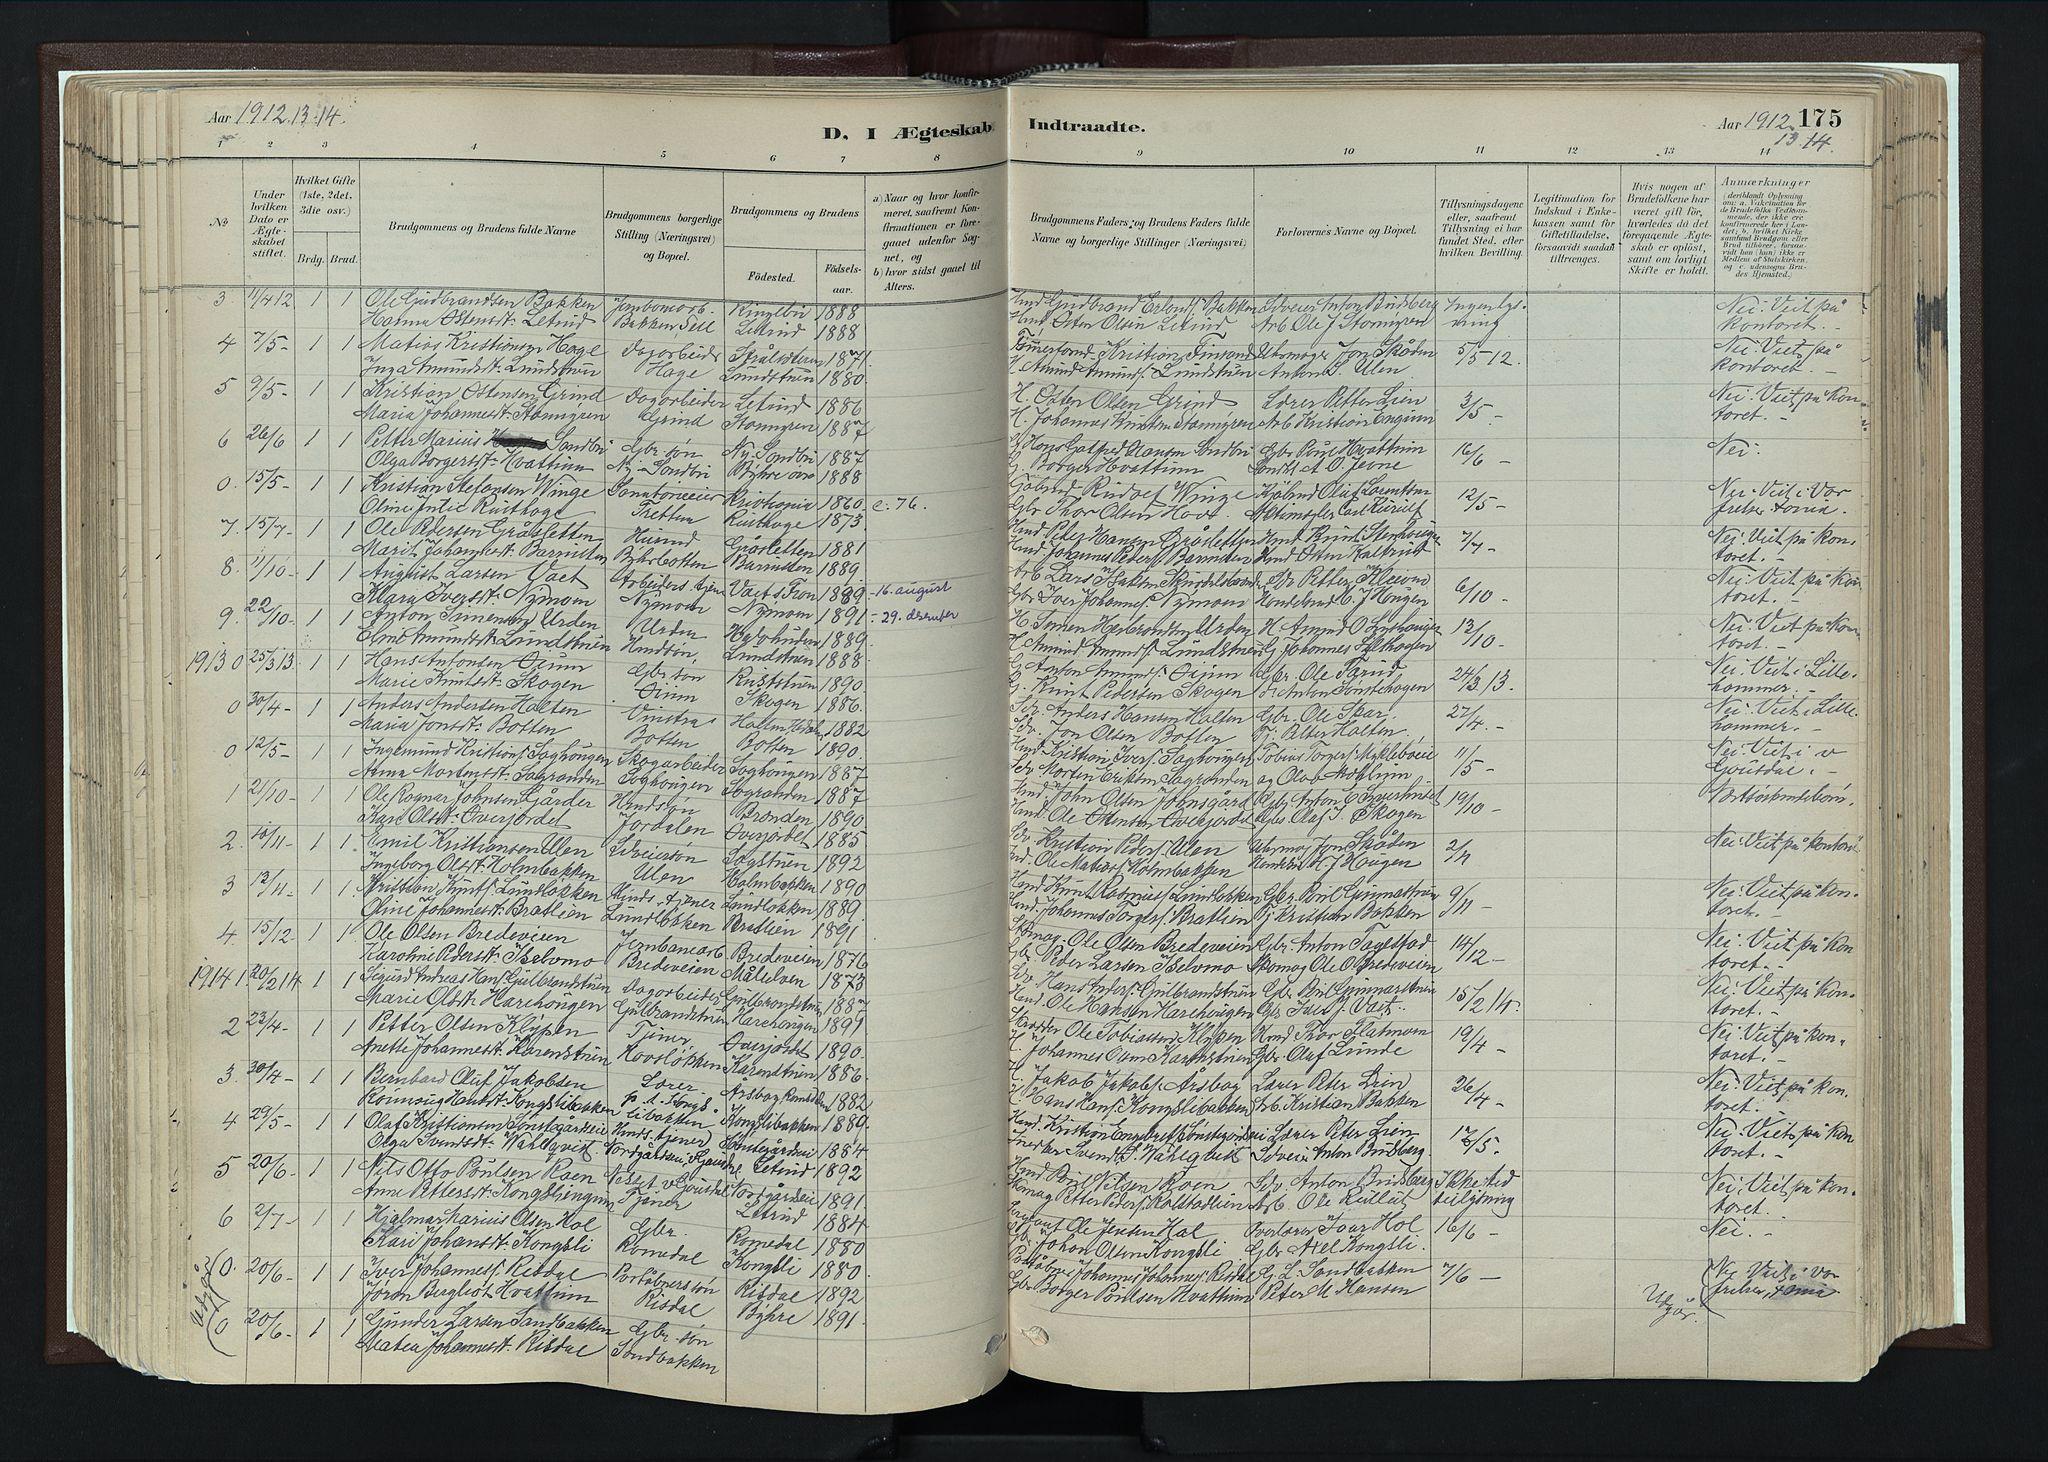 SAH, Nord-Fron prestekontor, Ministerialbok nr. 4, 1884-1914, s. 175